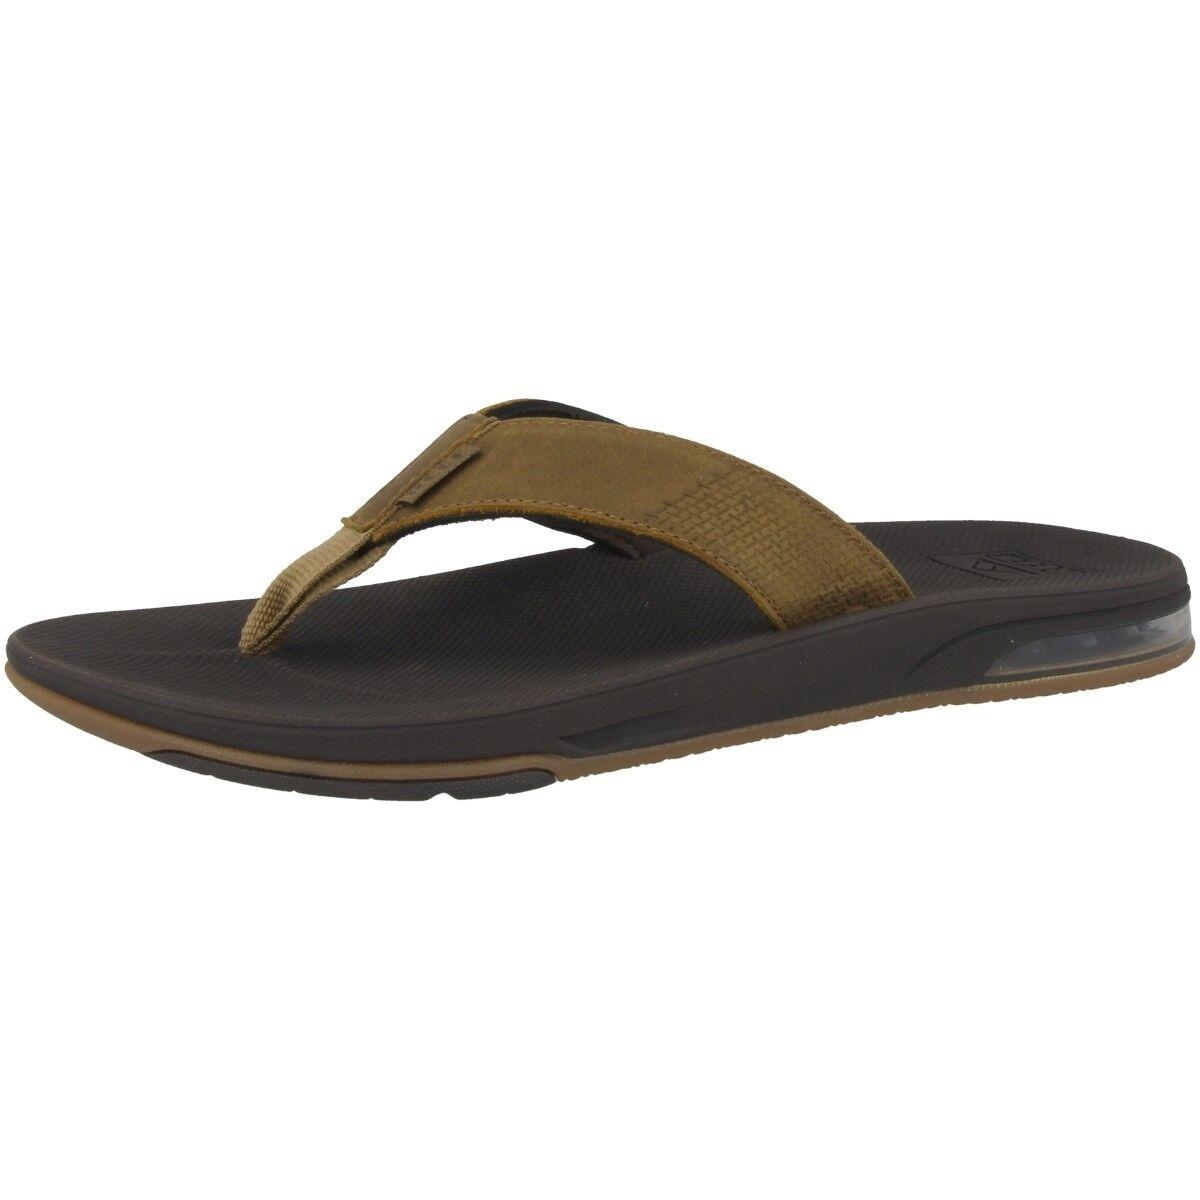 Reef Leather Fanning low tira dedo zapatos sandalia Chanclas Baño rf0a3ol2bro